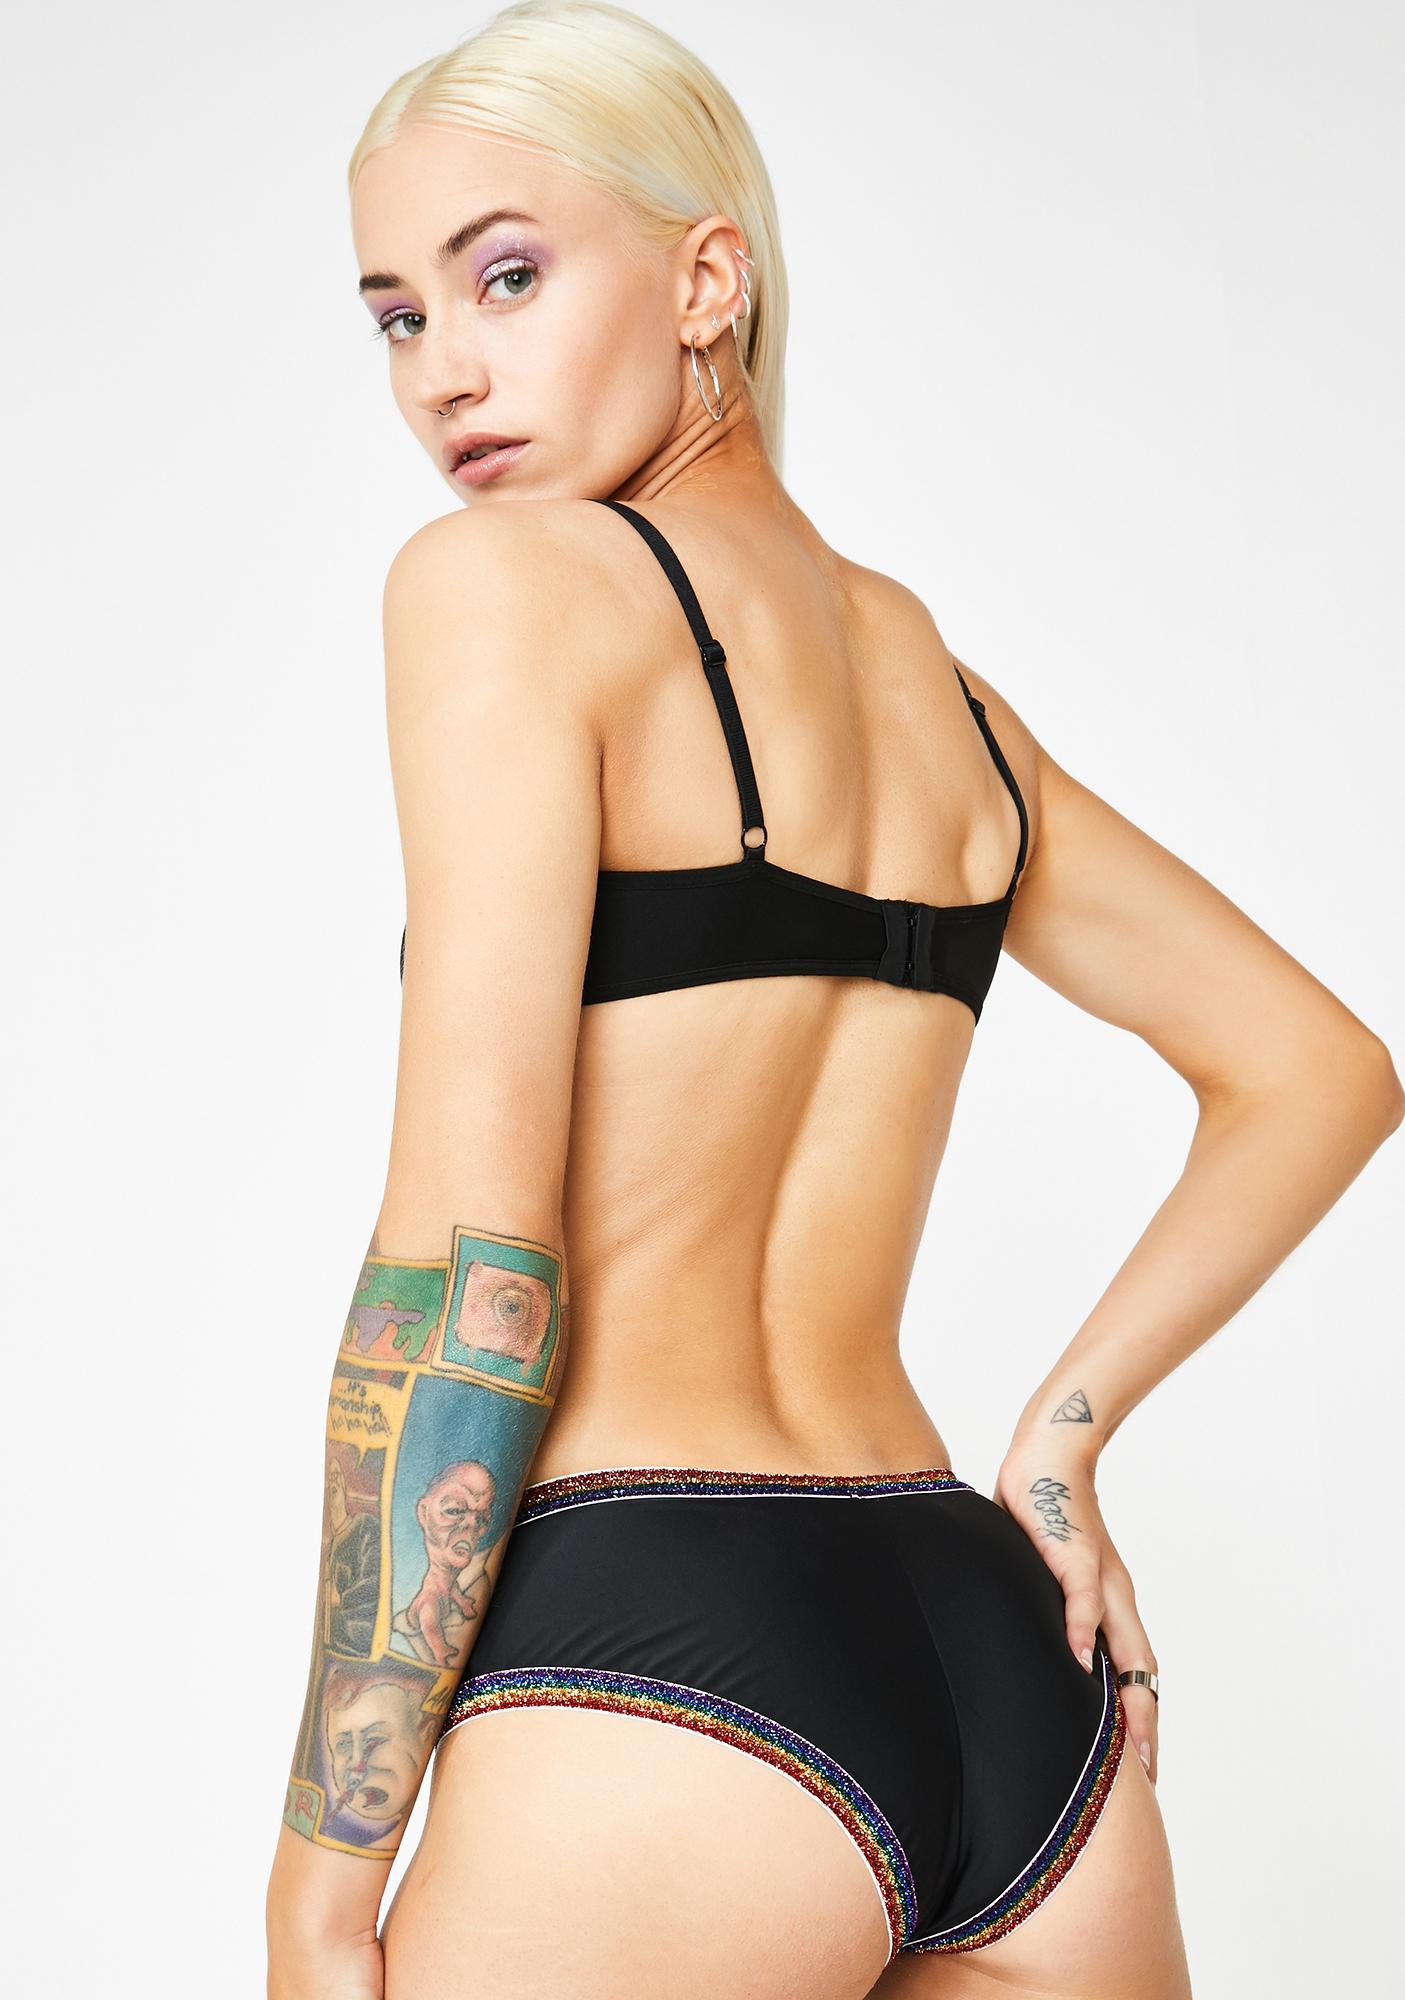 J Valentine Luna Divine Kiss Booty Shorts